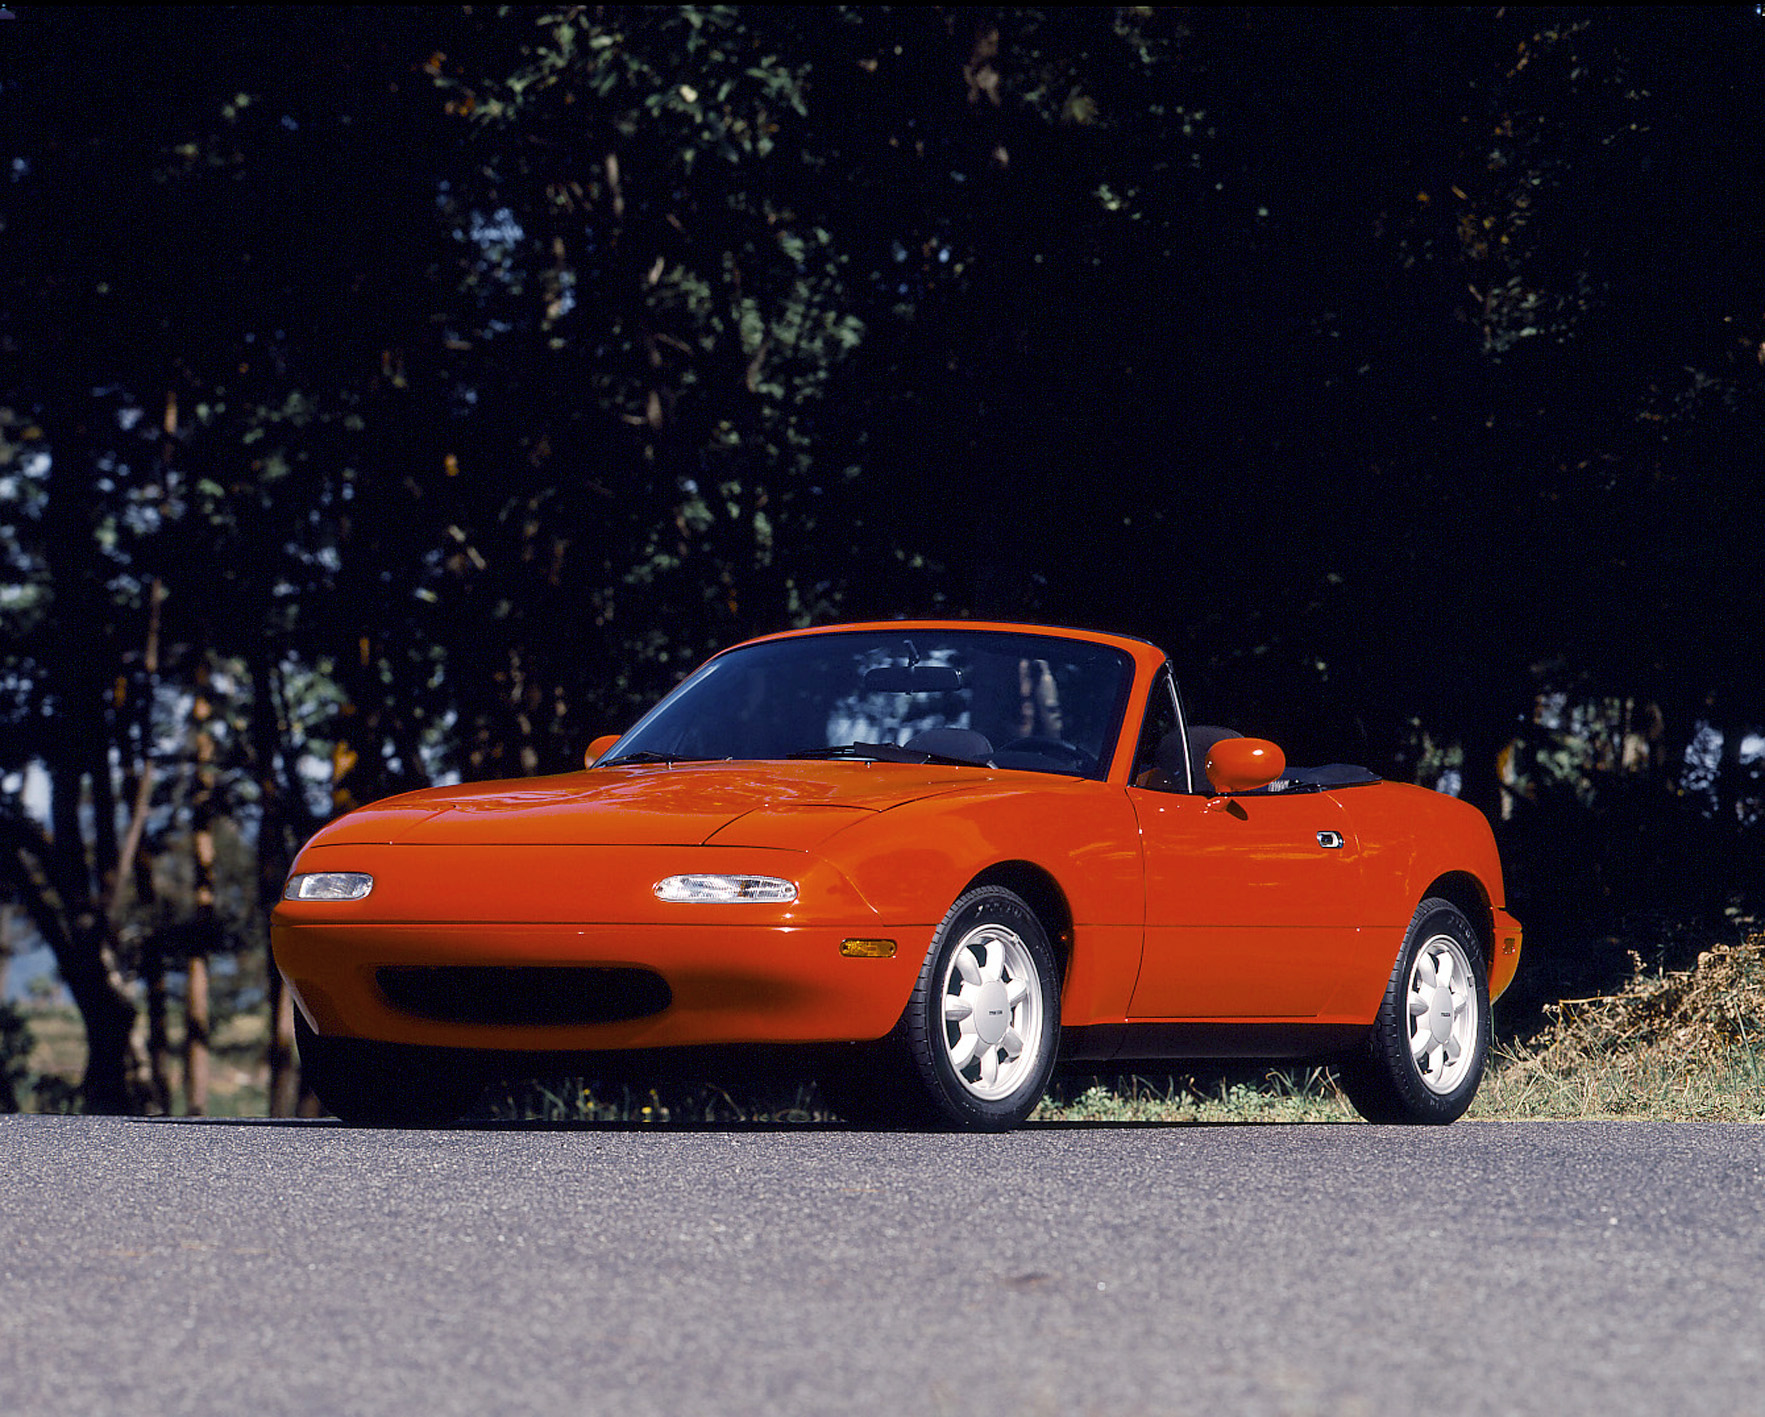 1990 mazda mx5 miata red front 3/4